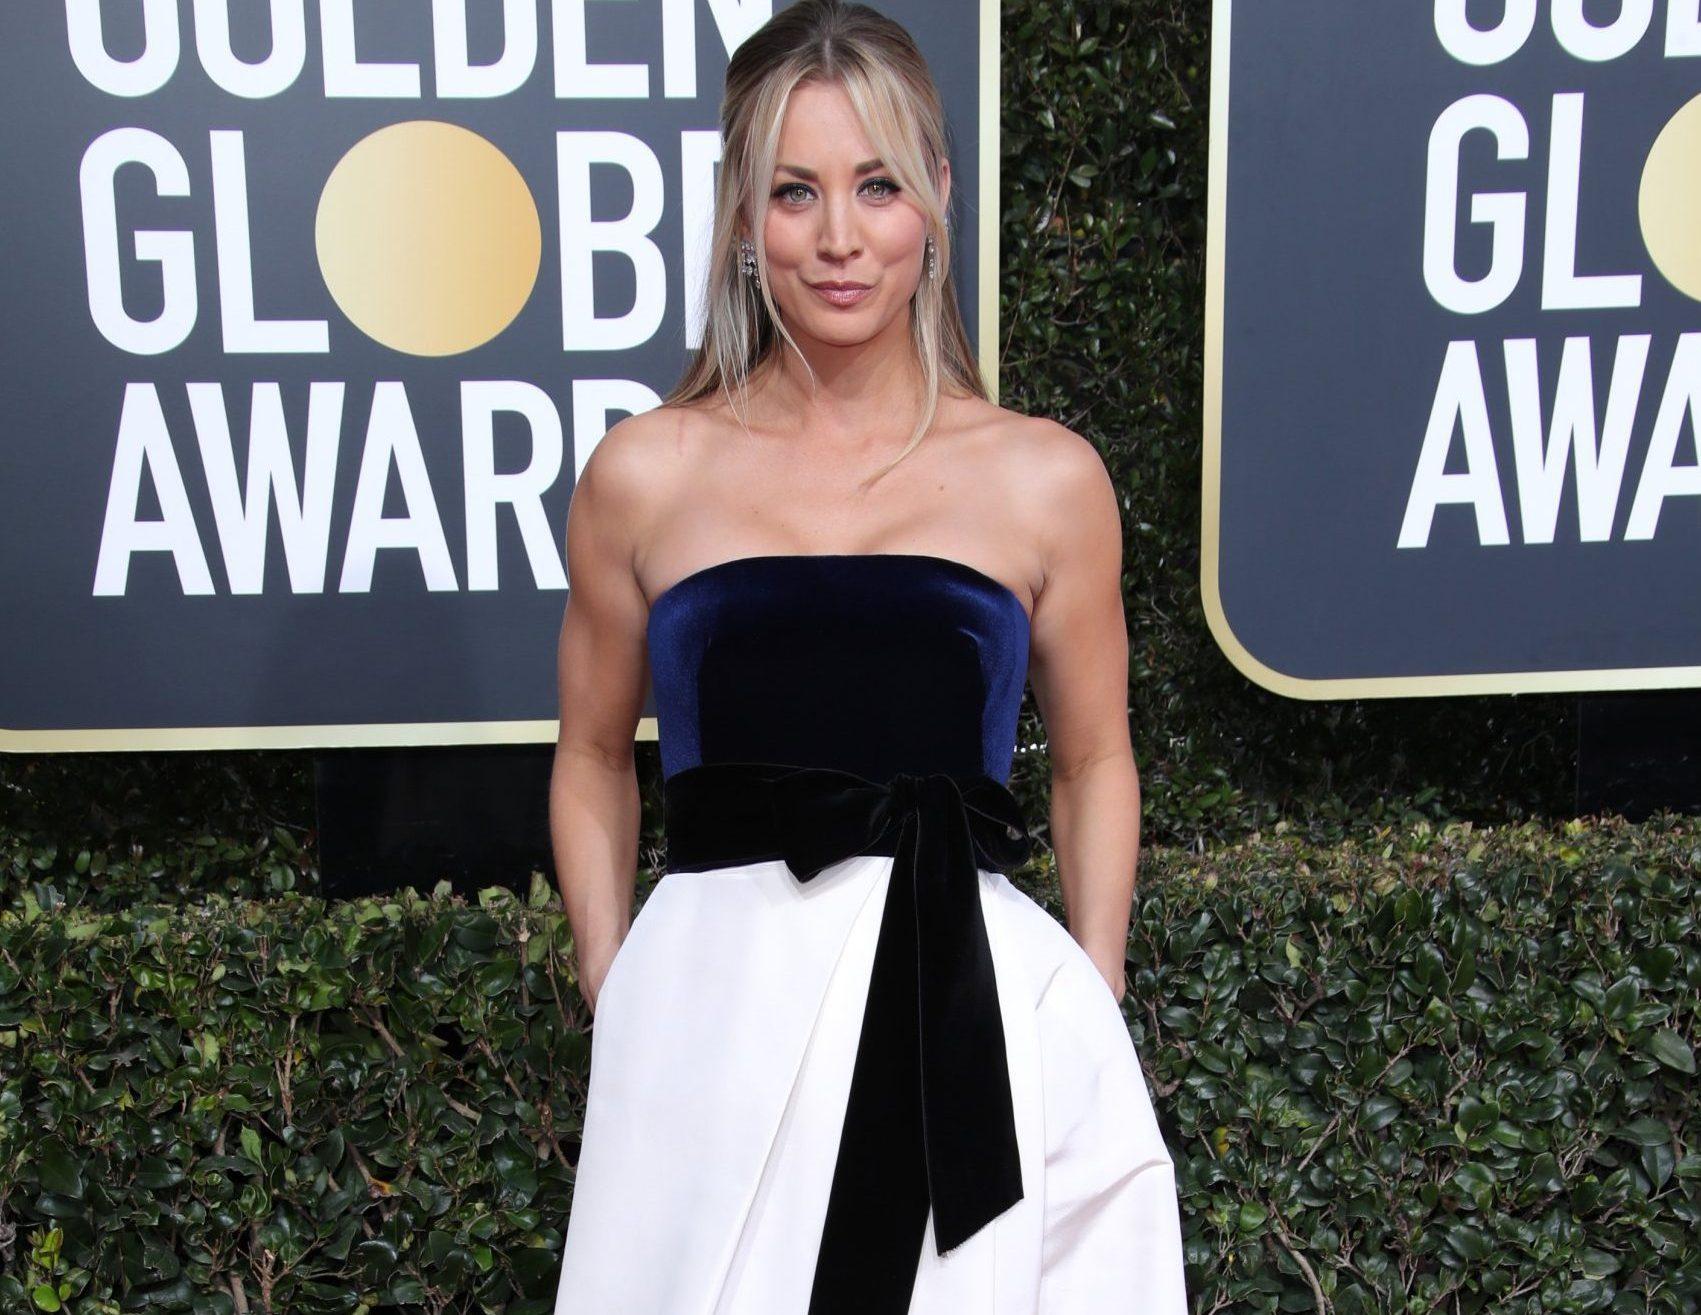 Mandatory Credit: Photo by Matt Baron/BEI/REX (10048067ir) Kaley Cuoco 76th Annual Golden Globe Awards, Arrivals, Los Angeles, USA - 06 Jan 2019